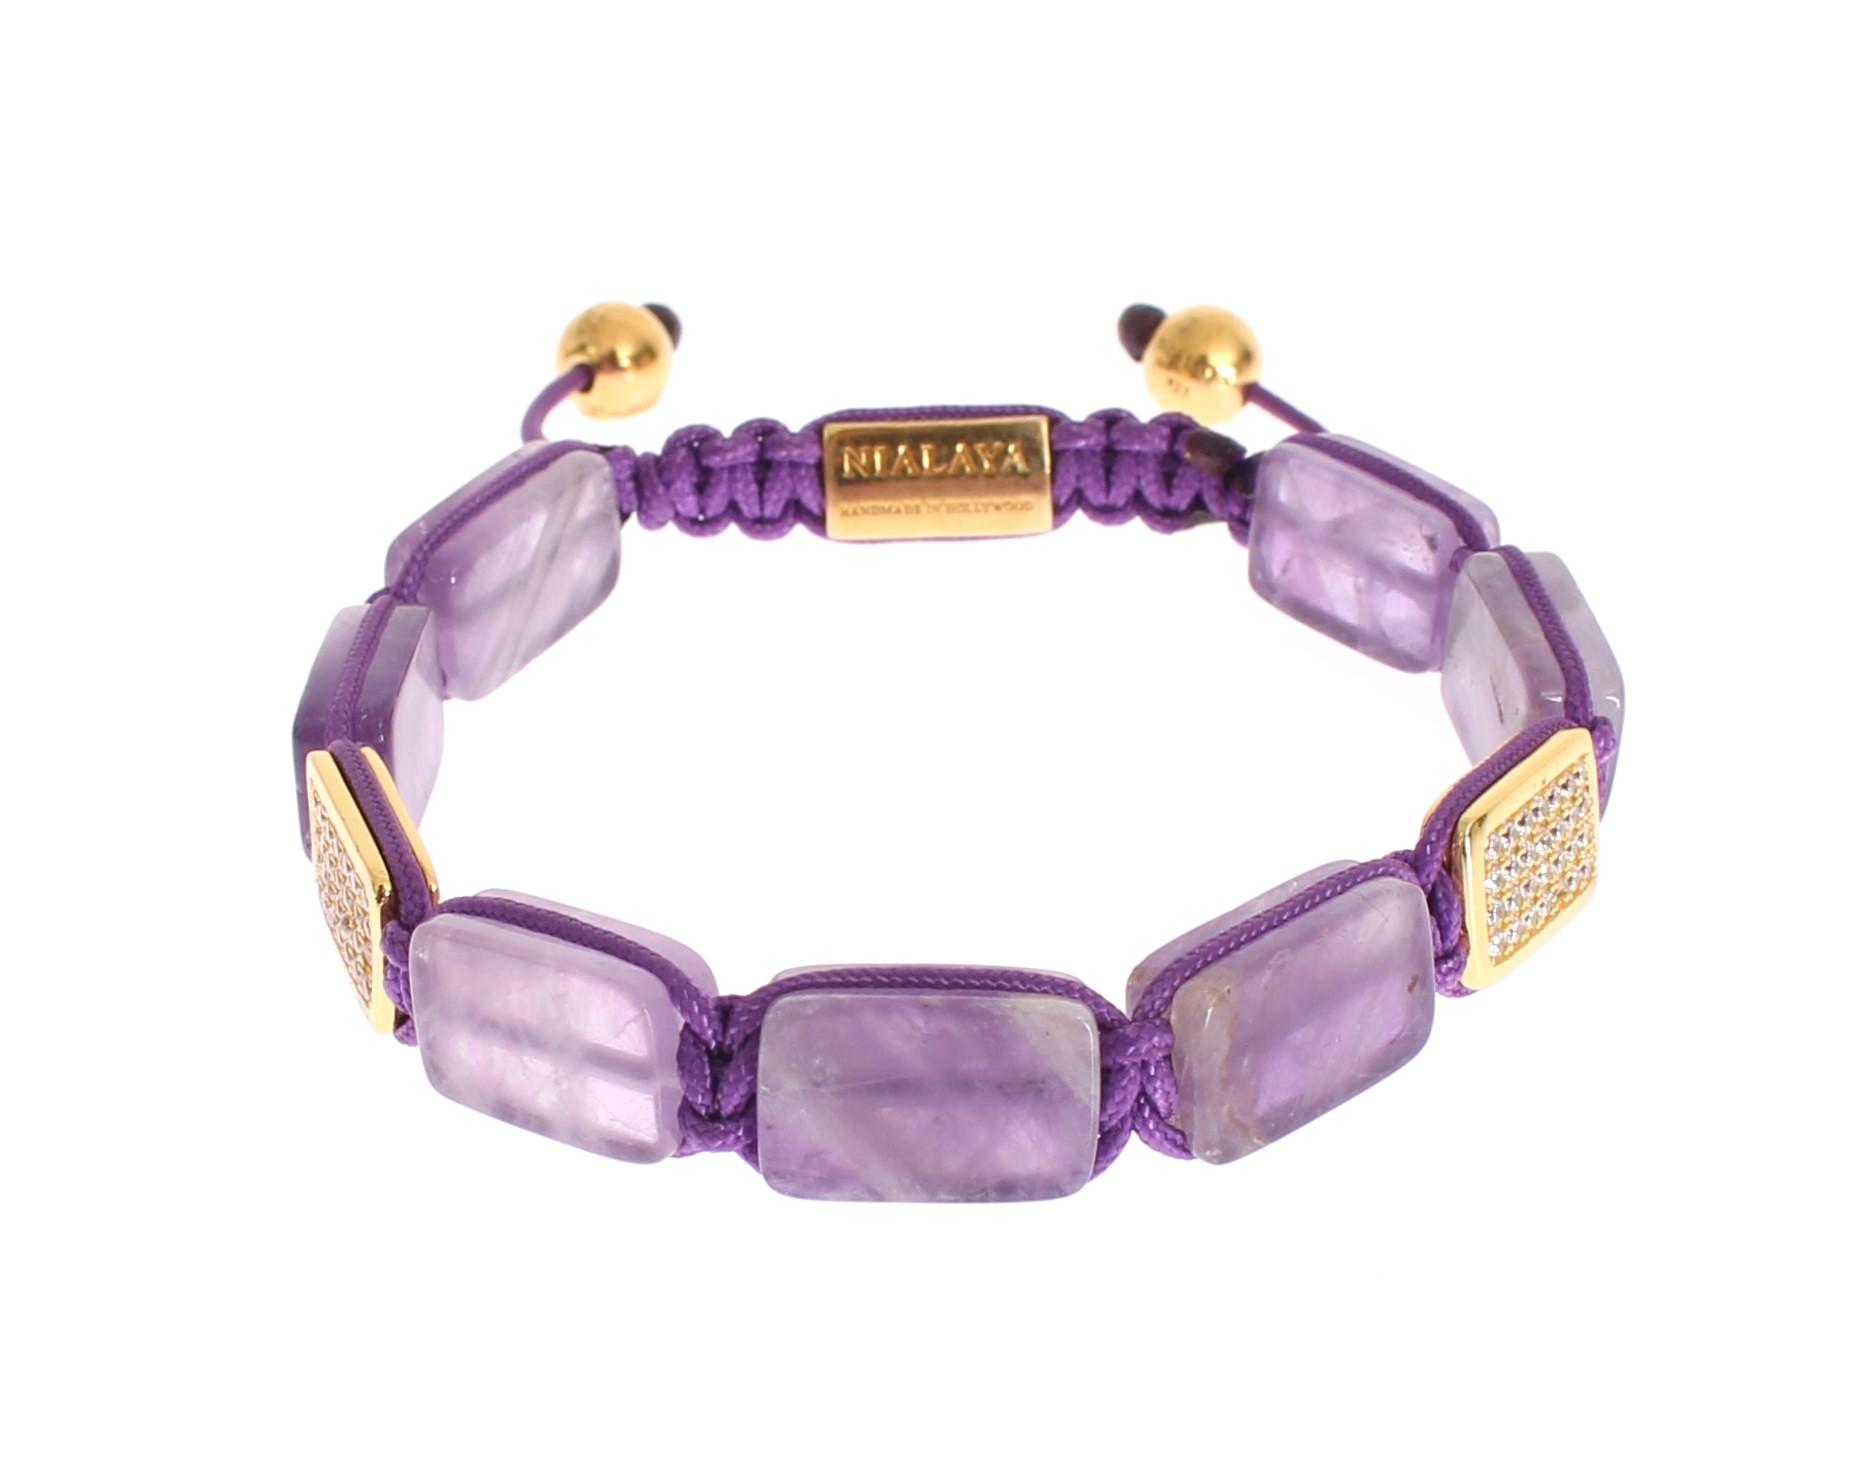 Nialaya Women's CZ Amethyst 18k Gold 925 Bracelet Purple NIA20249 - M